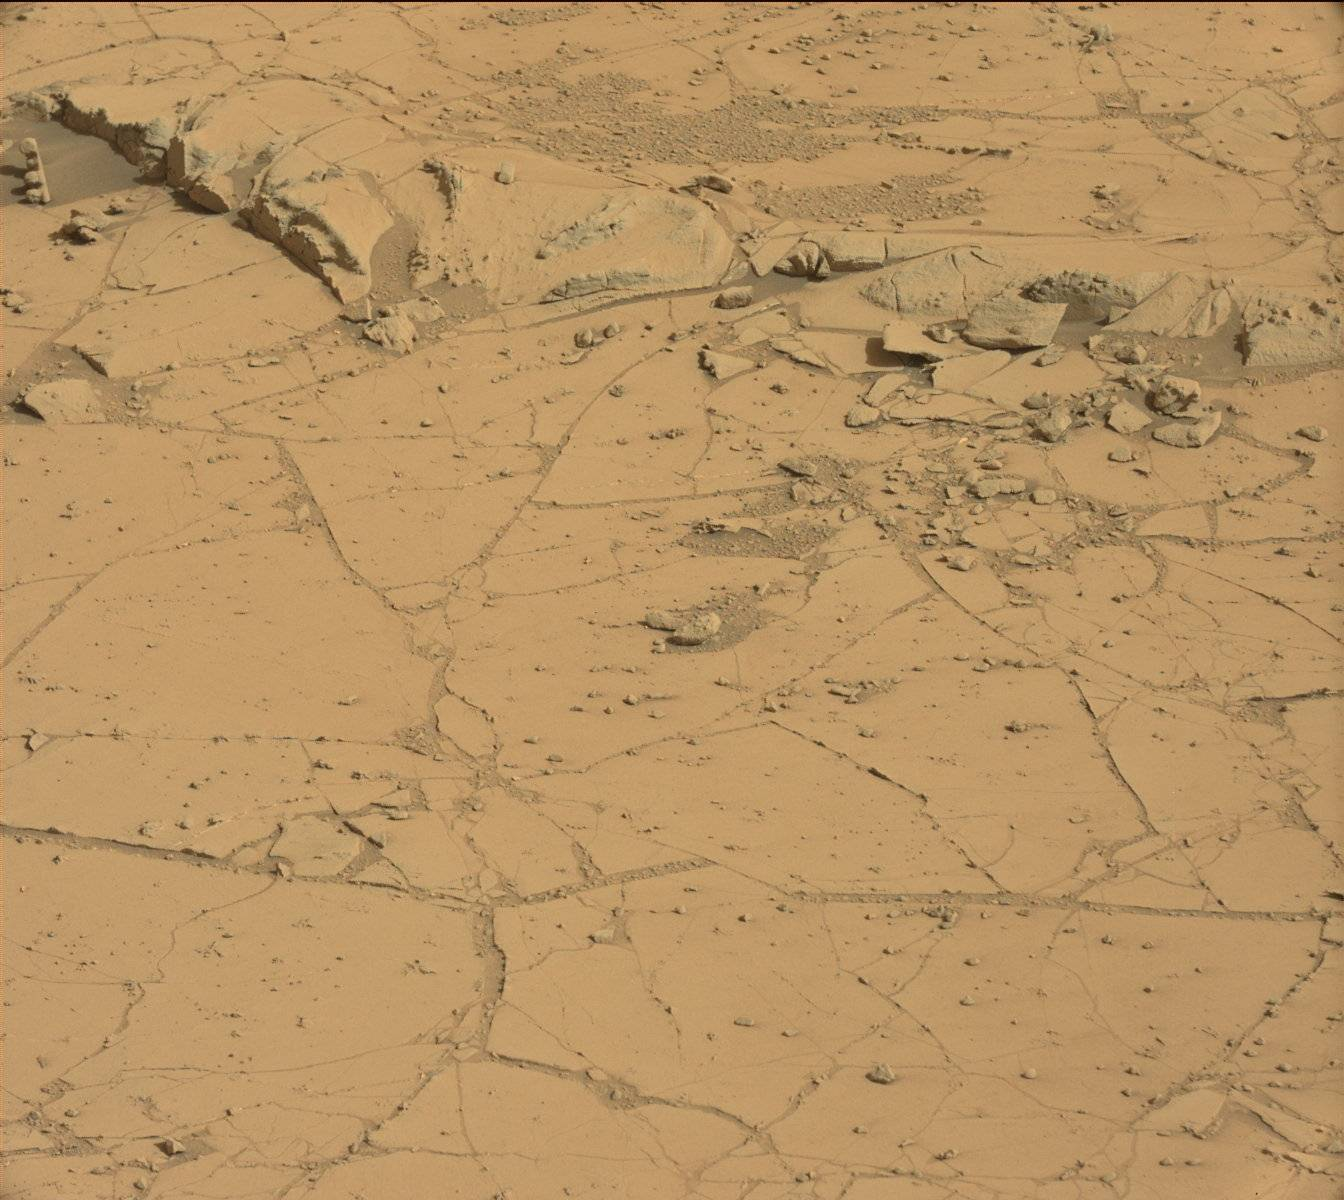 Marte : Misterio y Anomalías  0753ML0032370000400001E01_DXXX